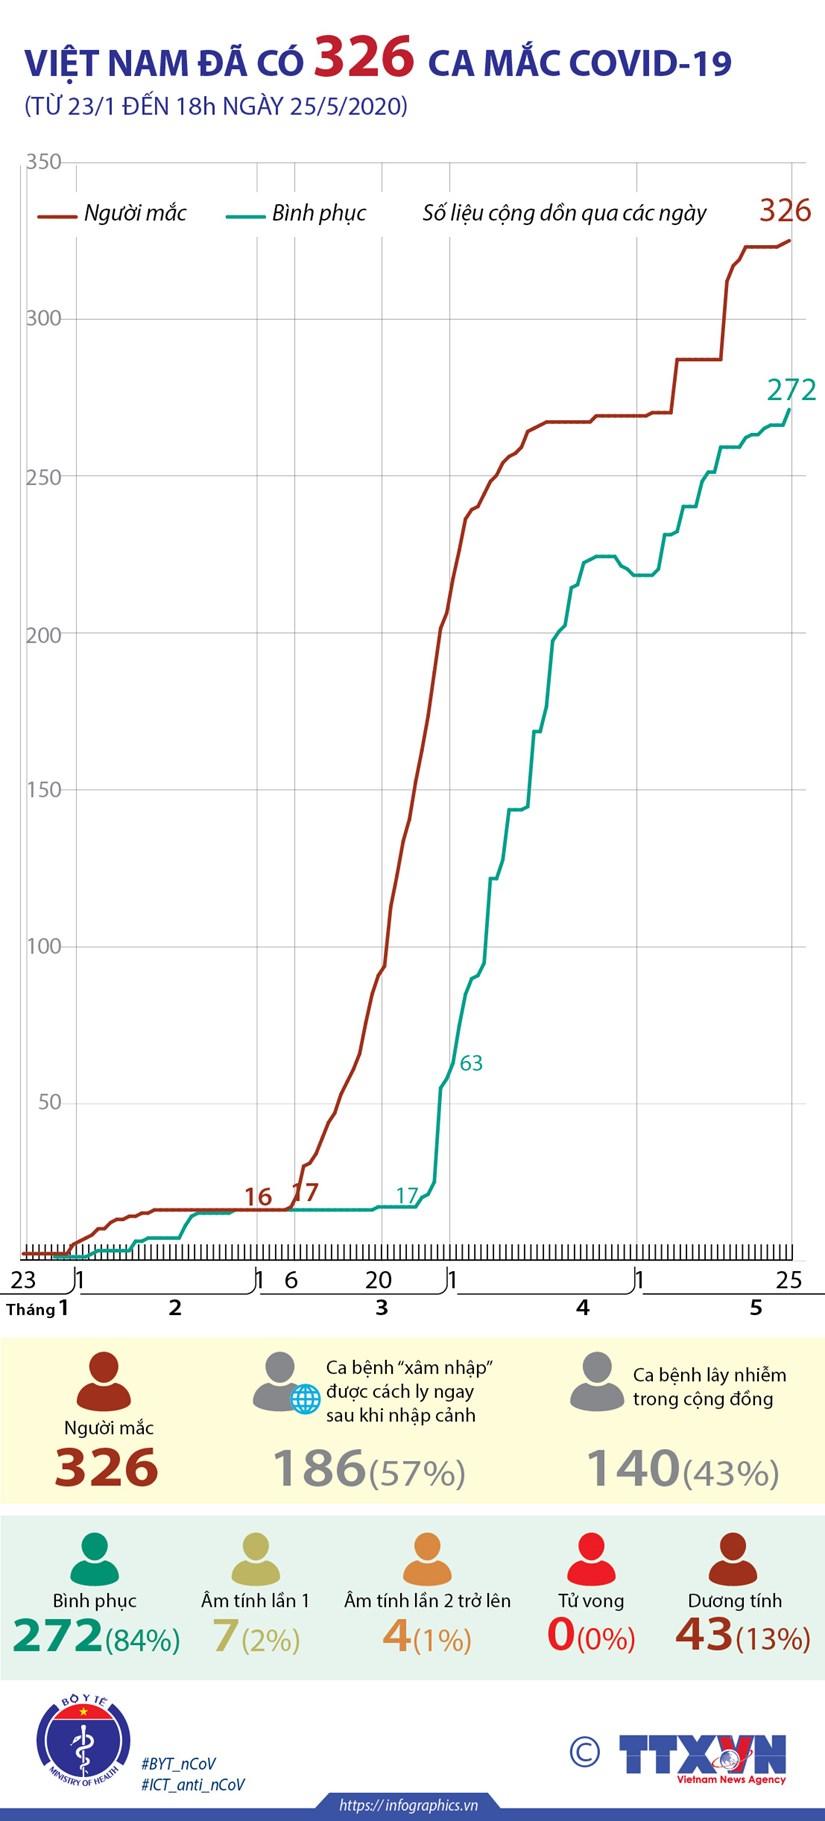 [Infographics] Den 18h ngay 25/5, Viet Nam da co 326 ca mac COVID-19 hinh anh 1